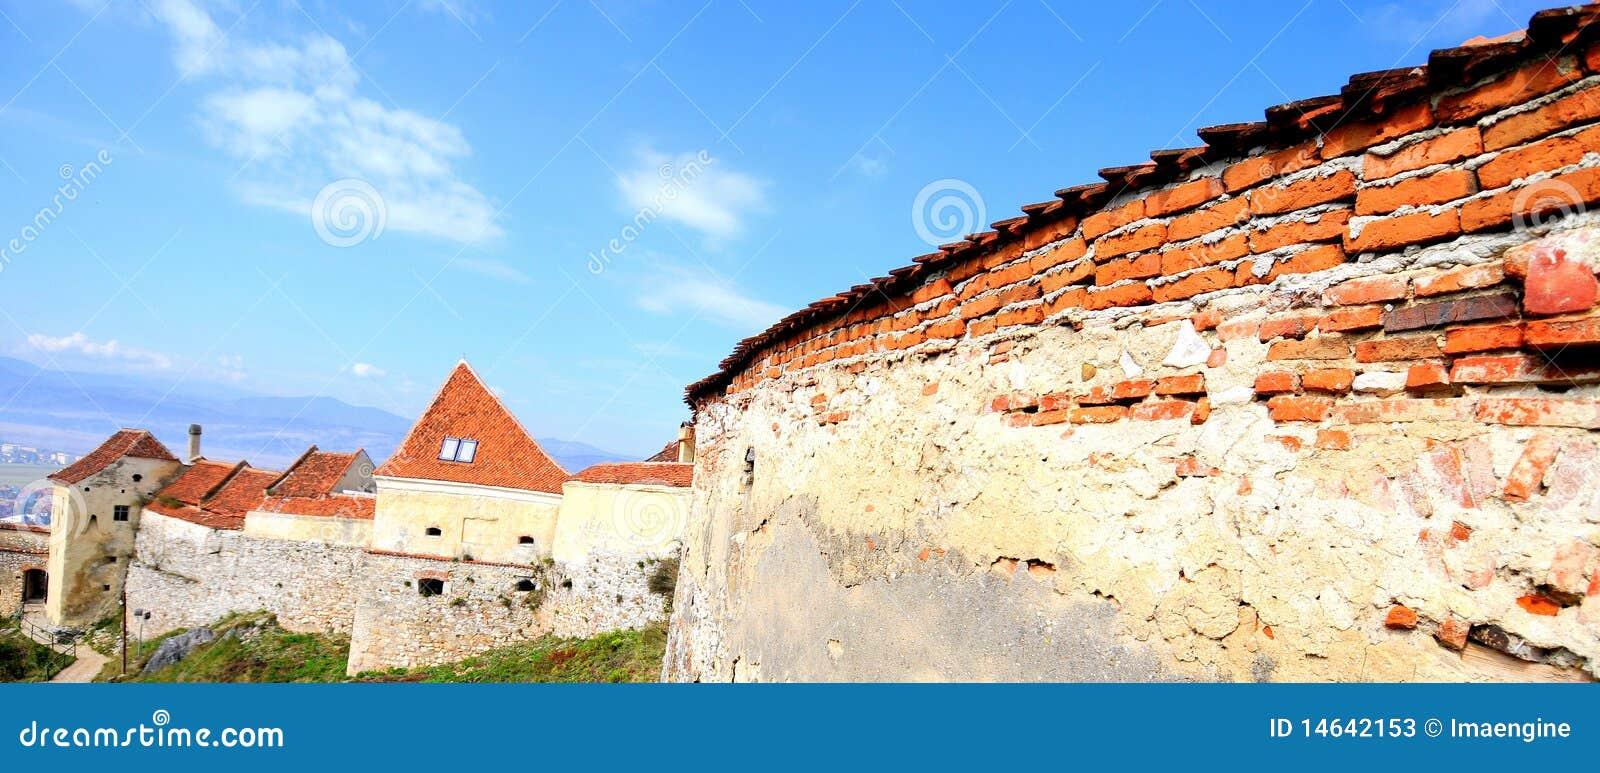 Fortress walls, Rasnov-Romania